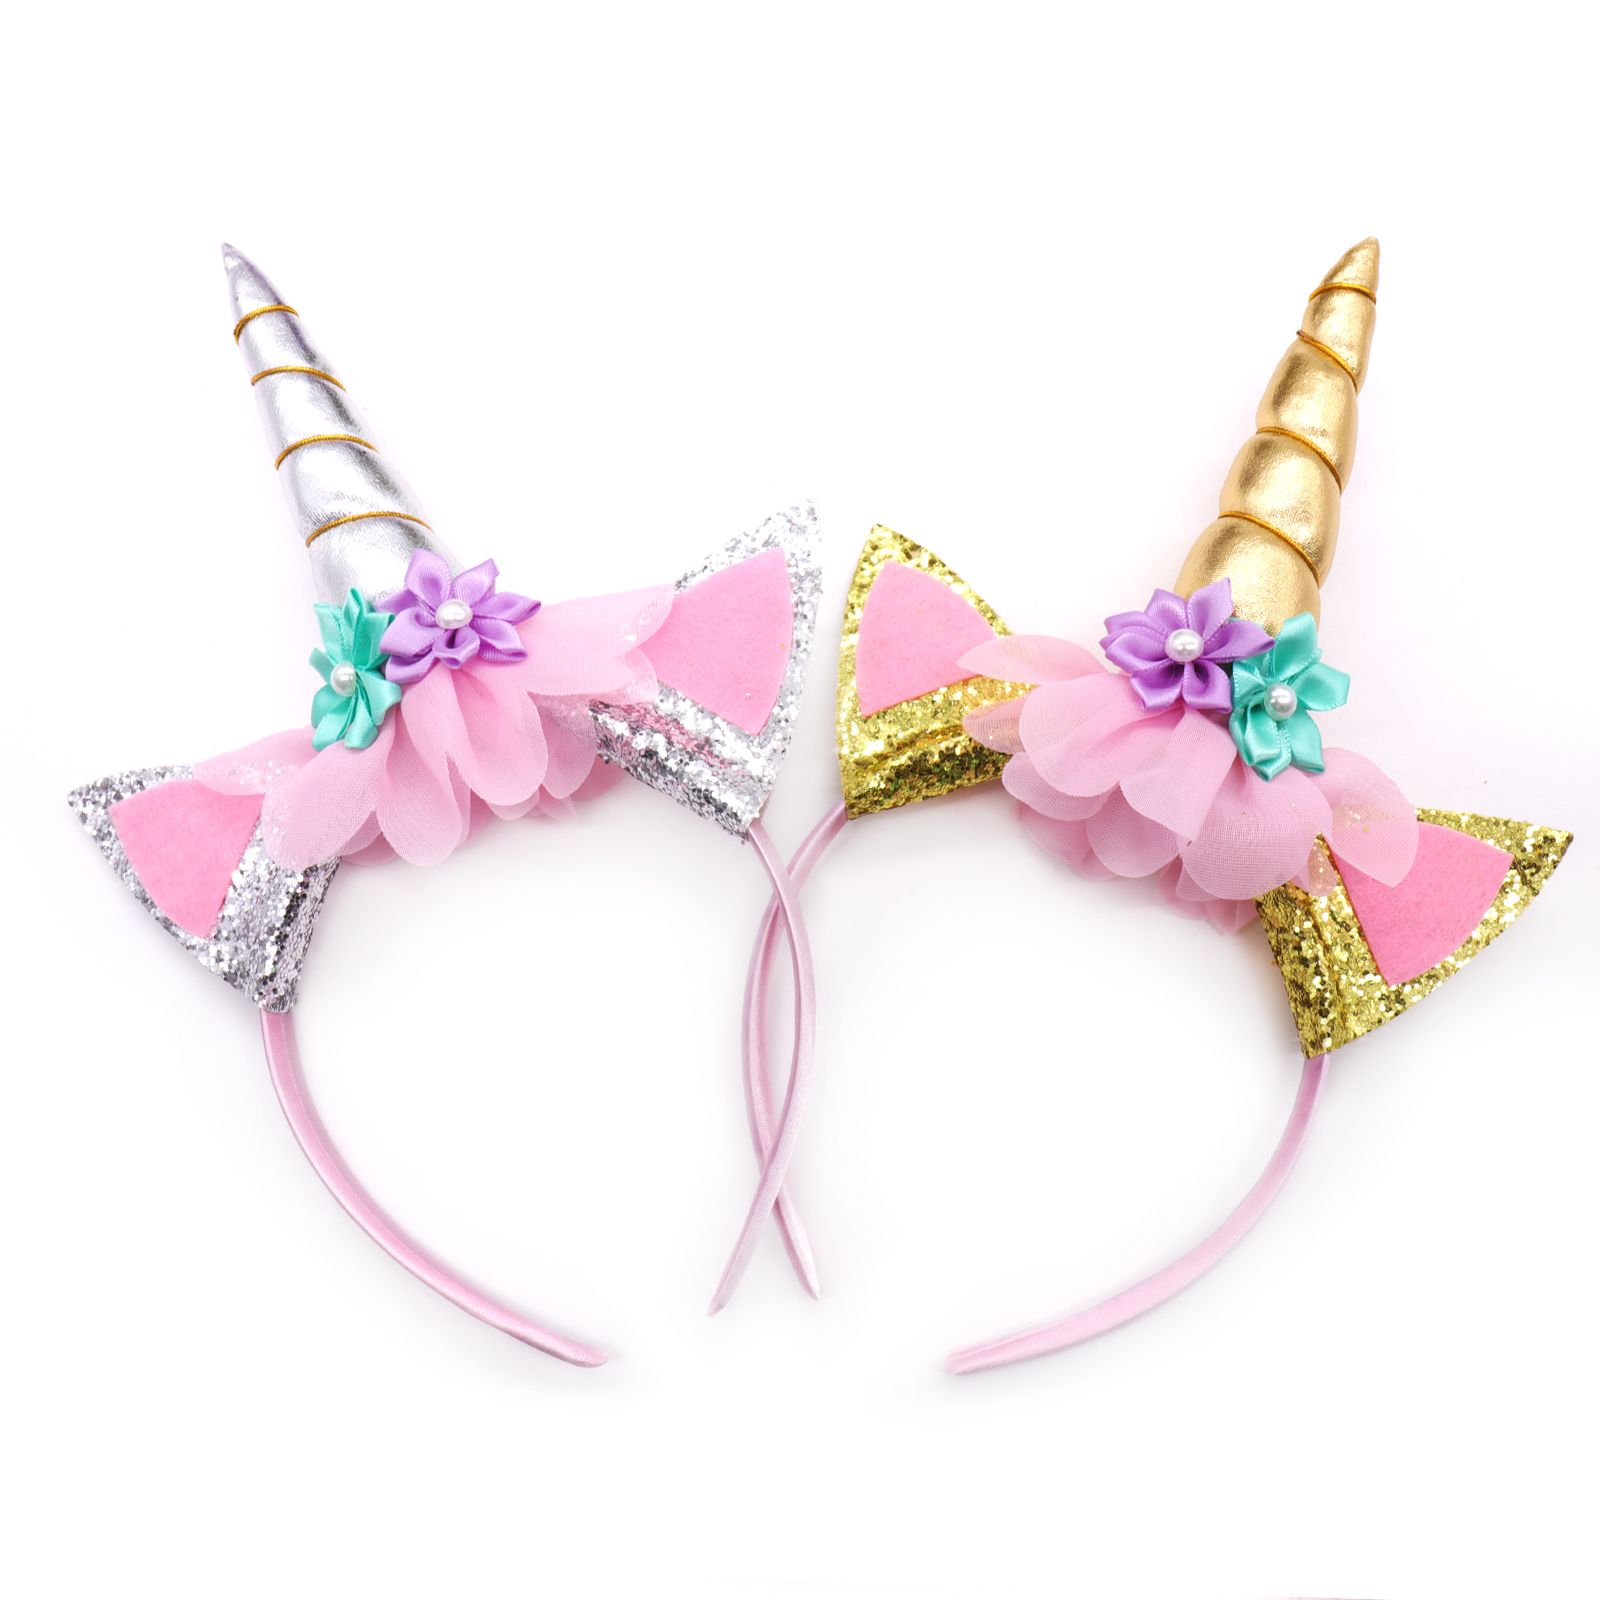 Aliexpress Com Buy 1pcs Cute Decorative Magical Unicorn